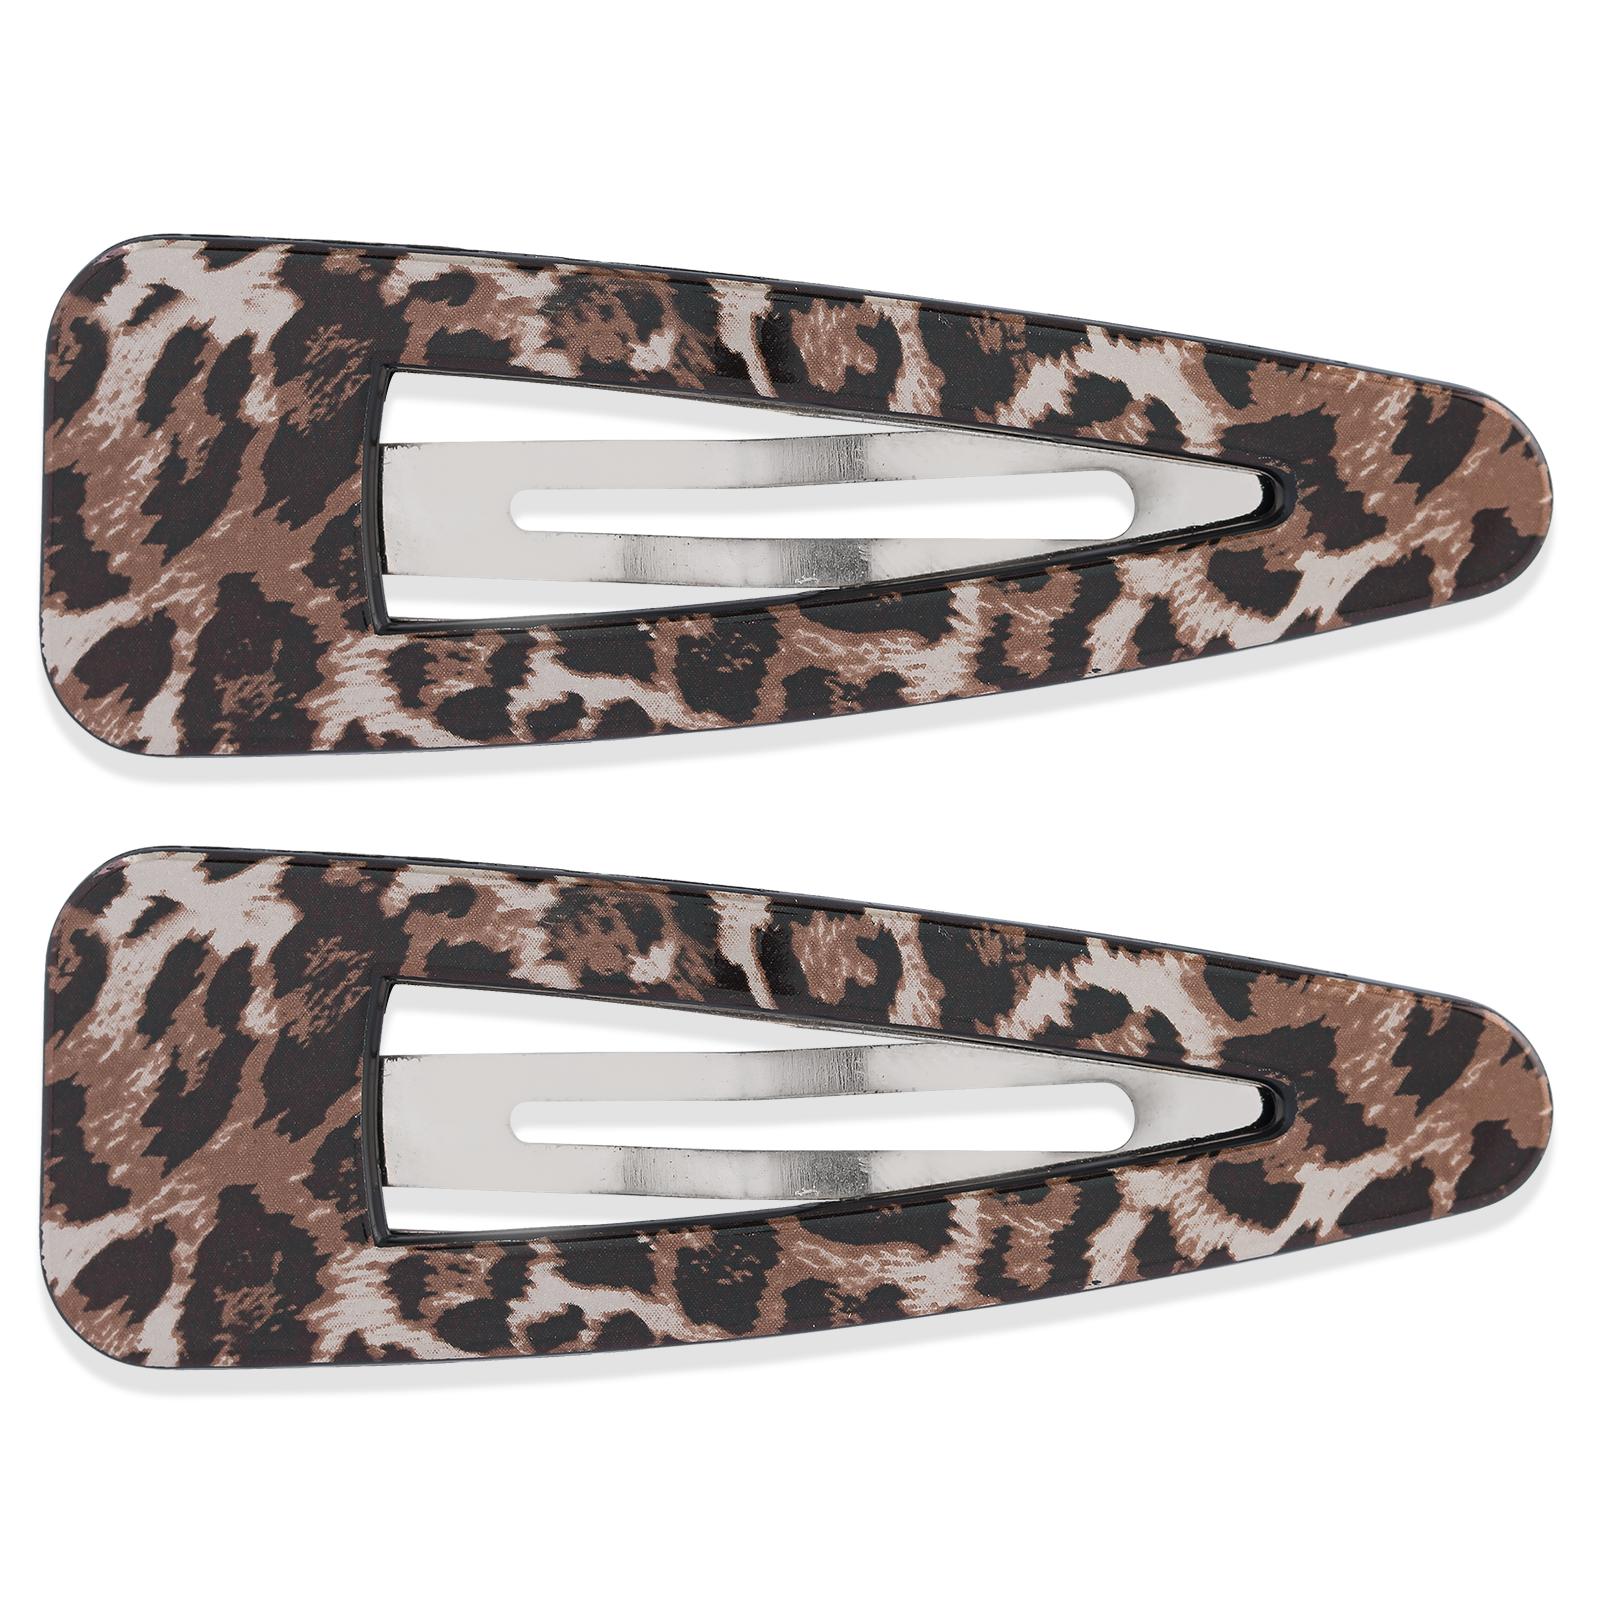 2-pack plasthårspännen Leopard